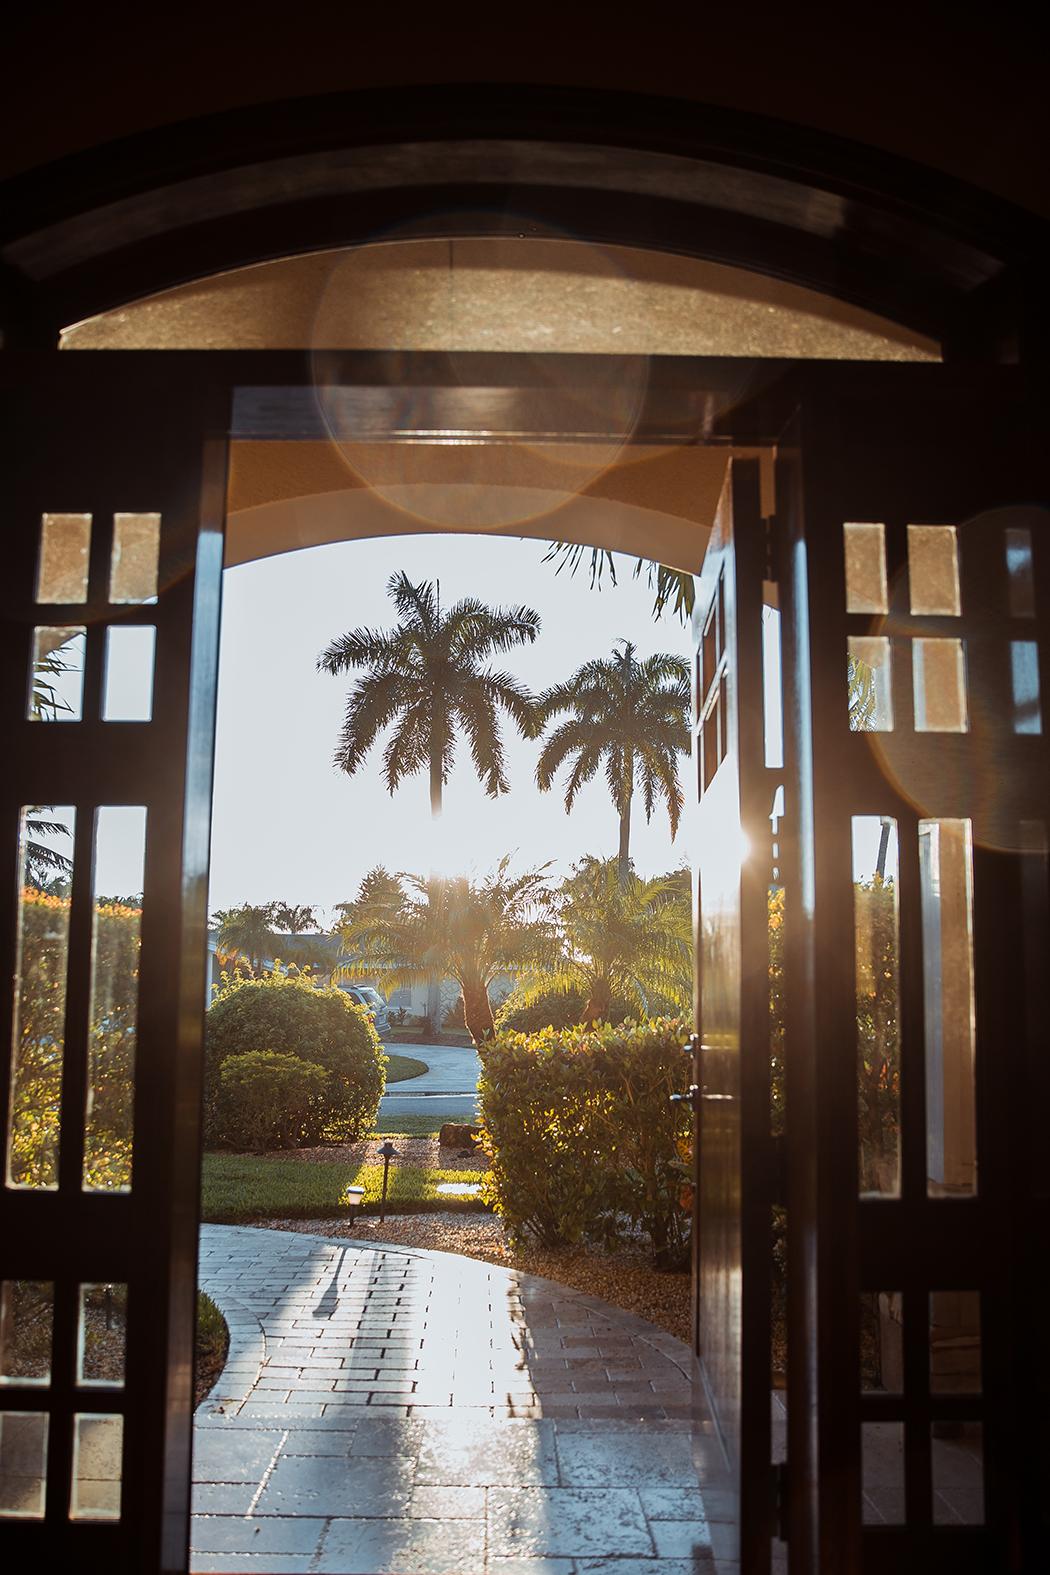 travelblog-travelblogger-reiseblog-reiseblogger-travel-reise-blog-blogger-homepage-florida-roadtrip-naples-miami-key_west-lindarella-8-web